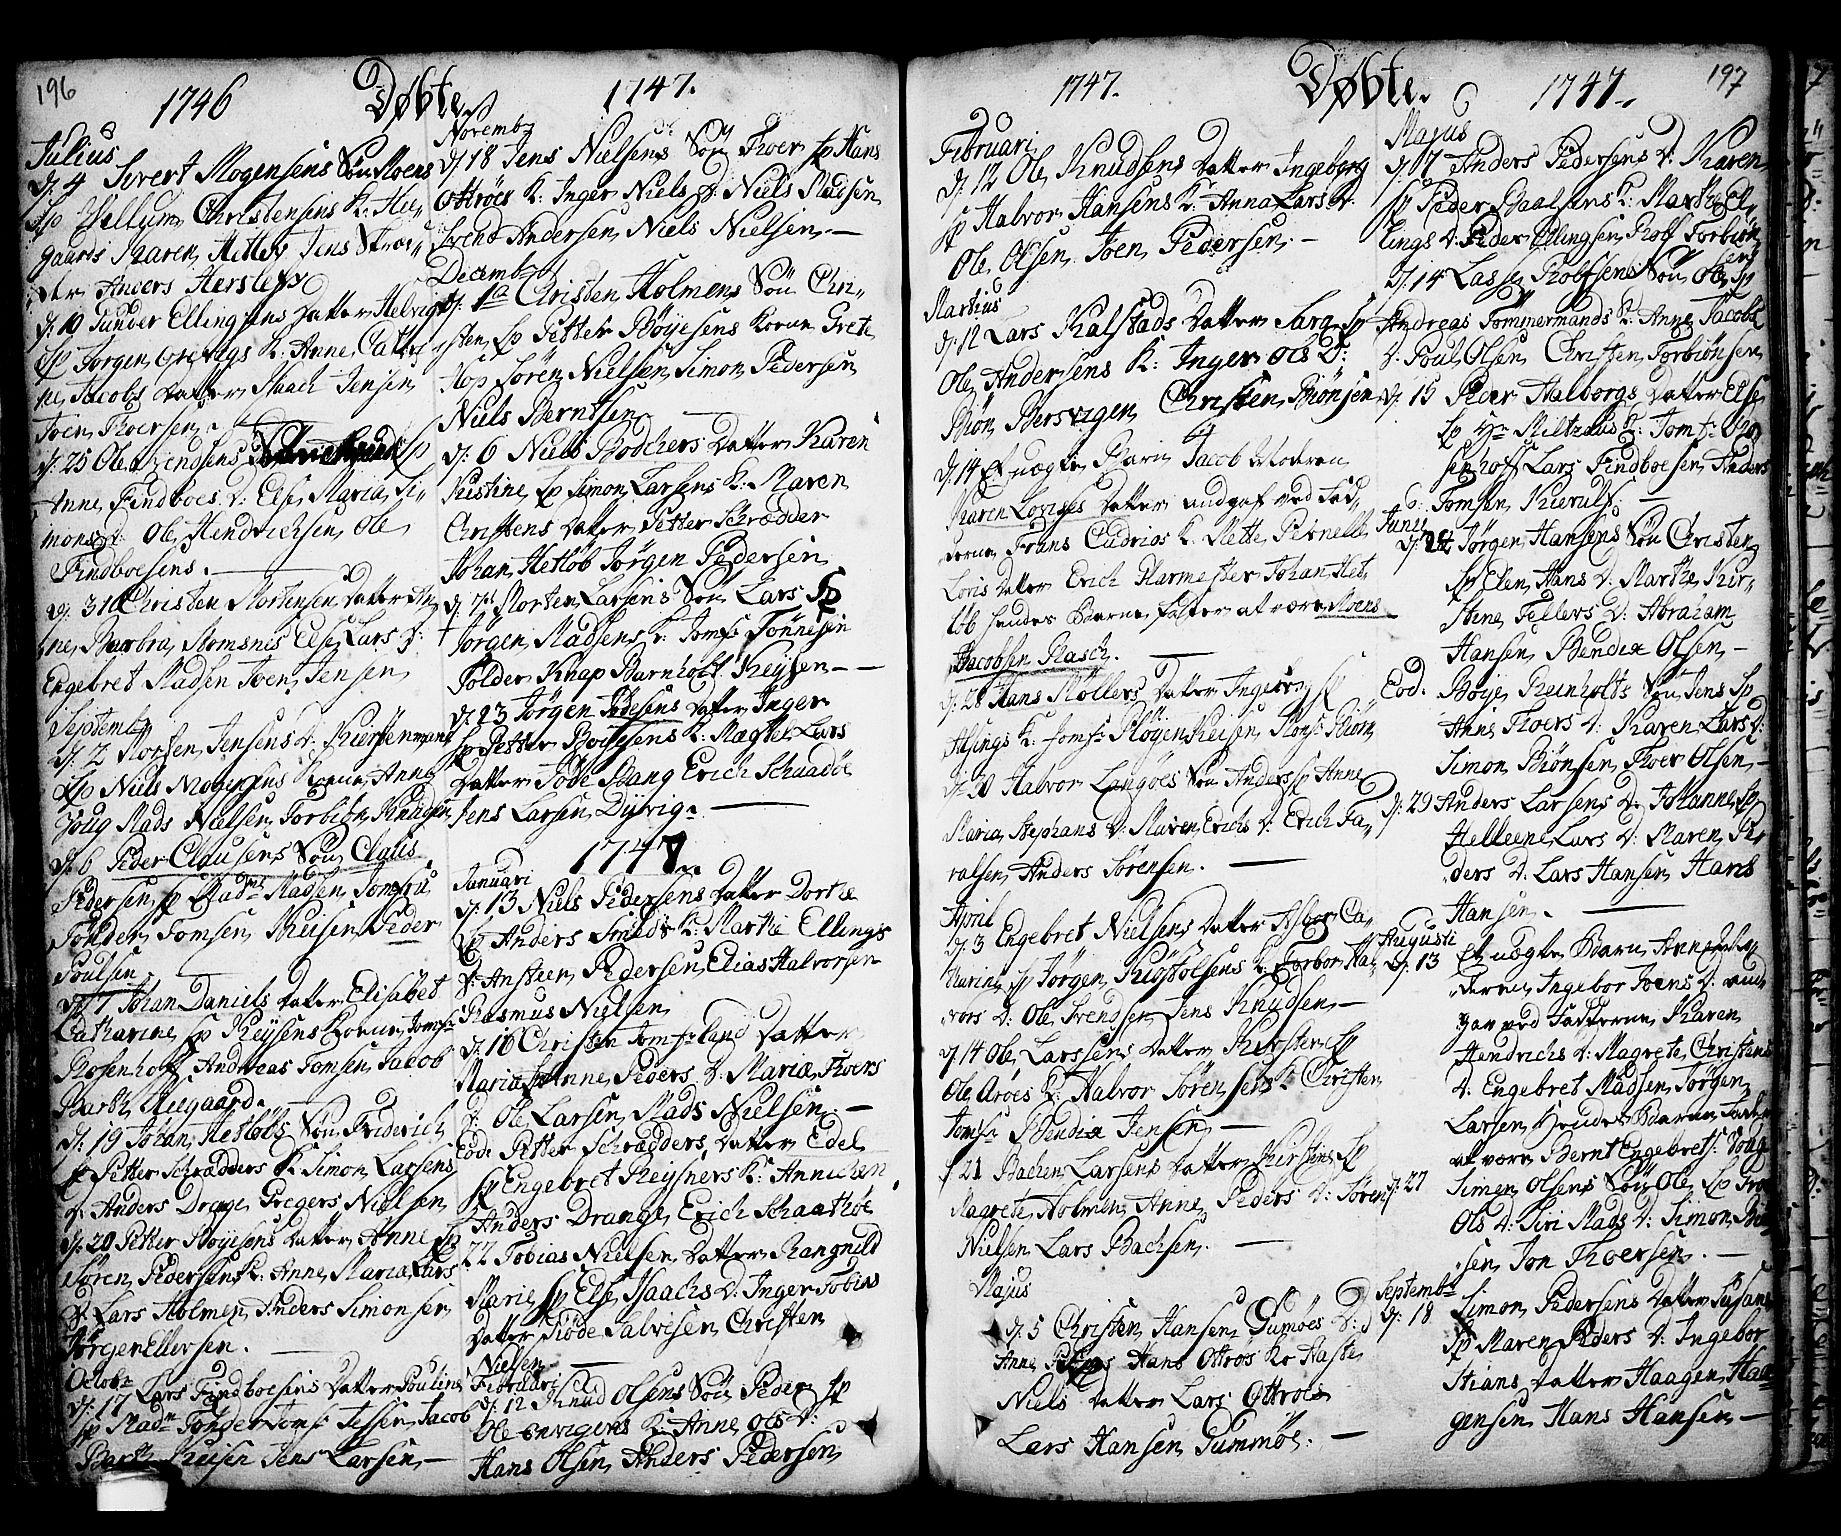 SAKO, Kragerø kirkebøker, F/Fa/L0001: Ministerialbok nr. 1, 1702-1766, s. 196-197